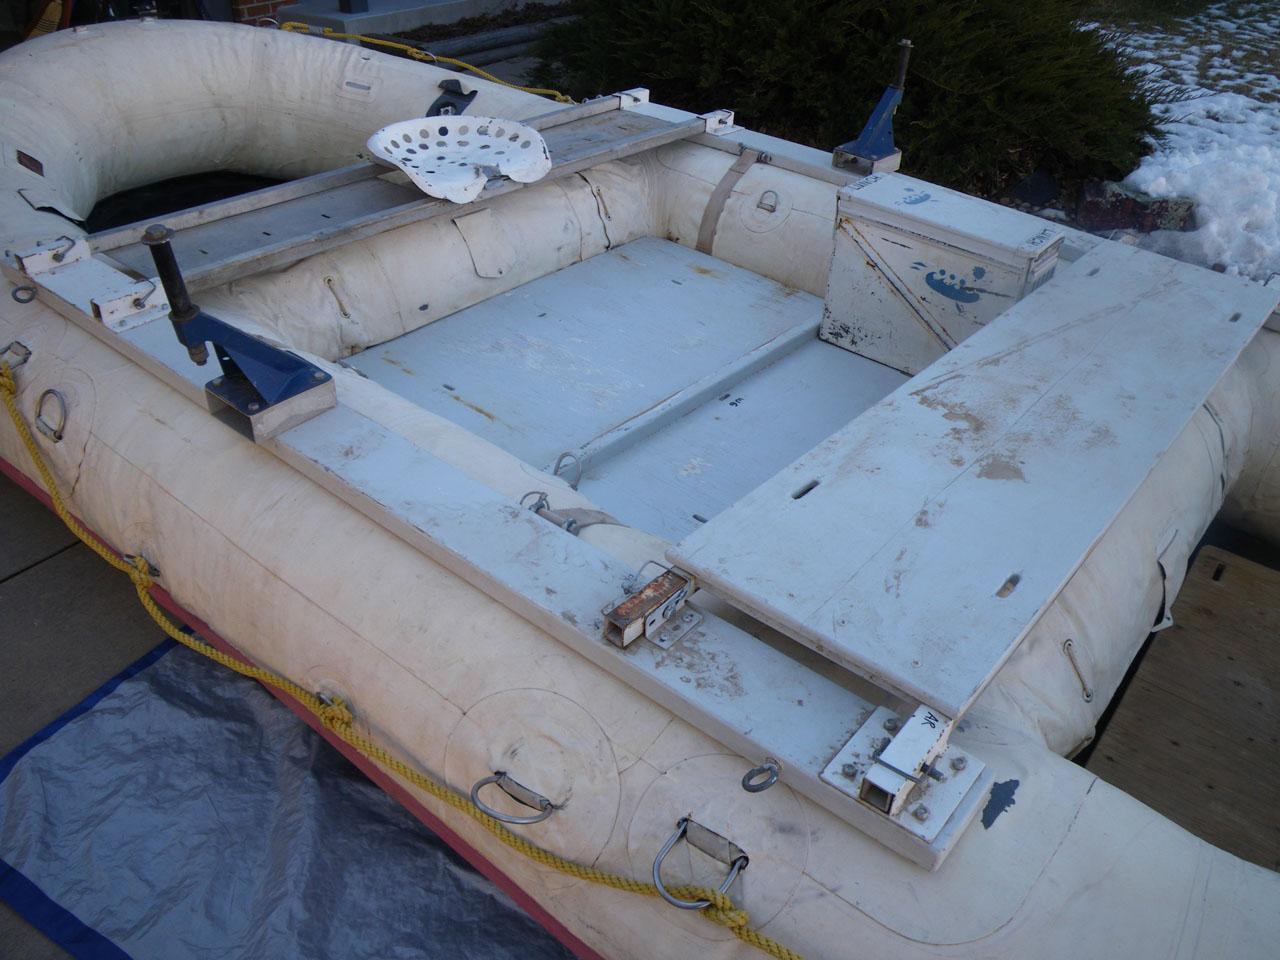 Click image for larger version  Name:02 - Campways Havasu w Box.JPG Views:339 Size:224.9 KB ID:9520